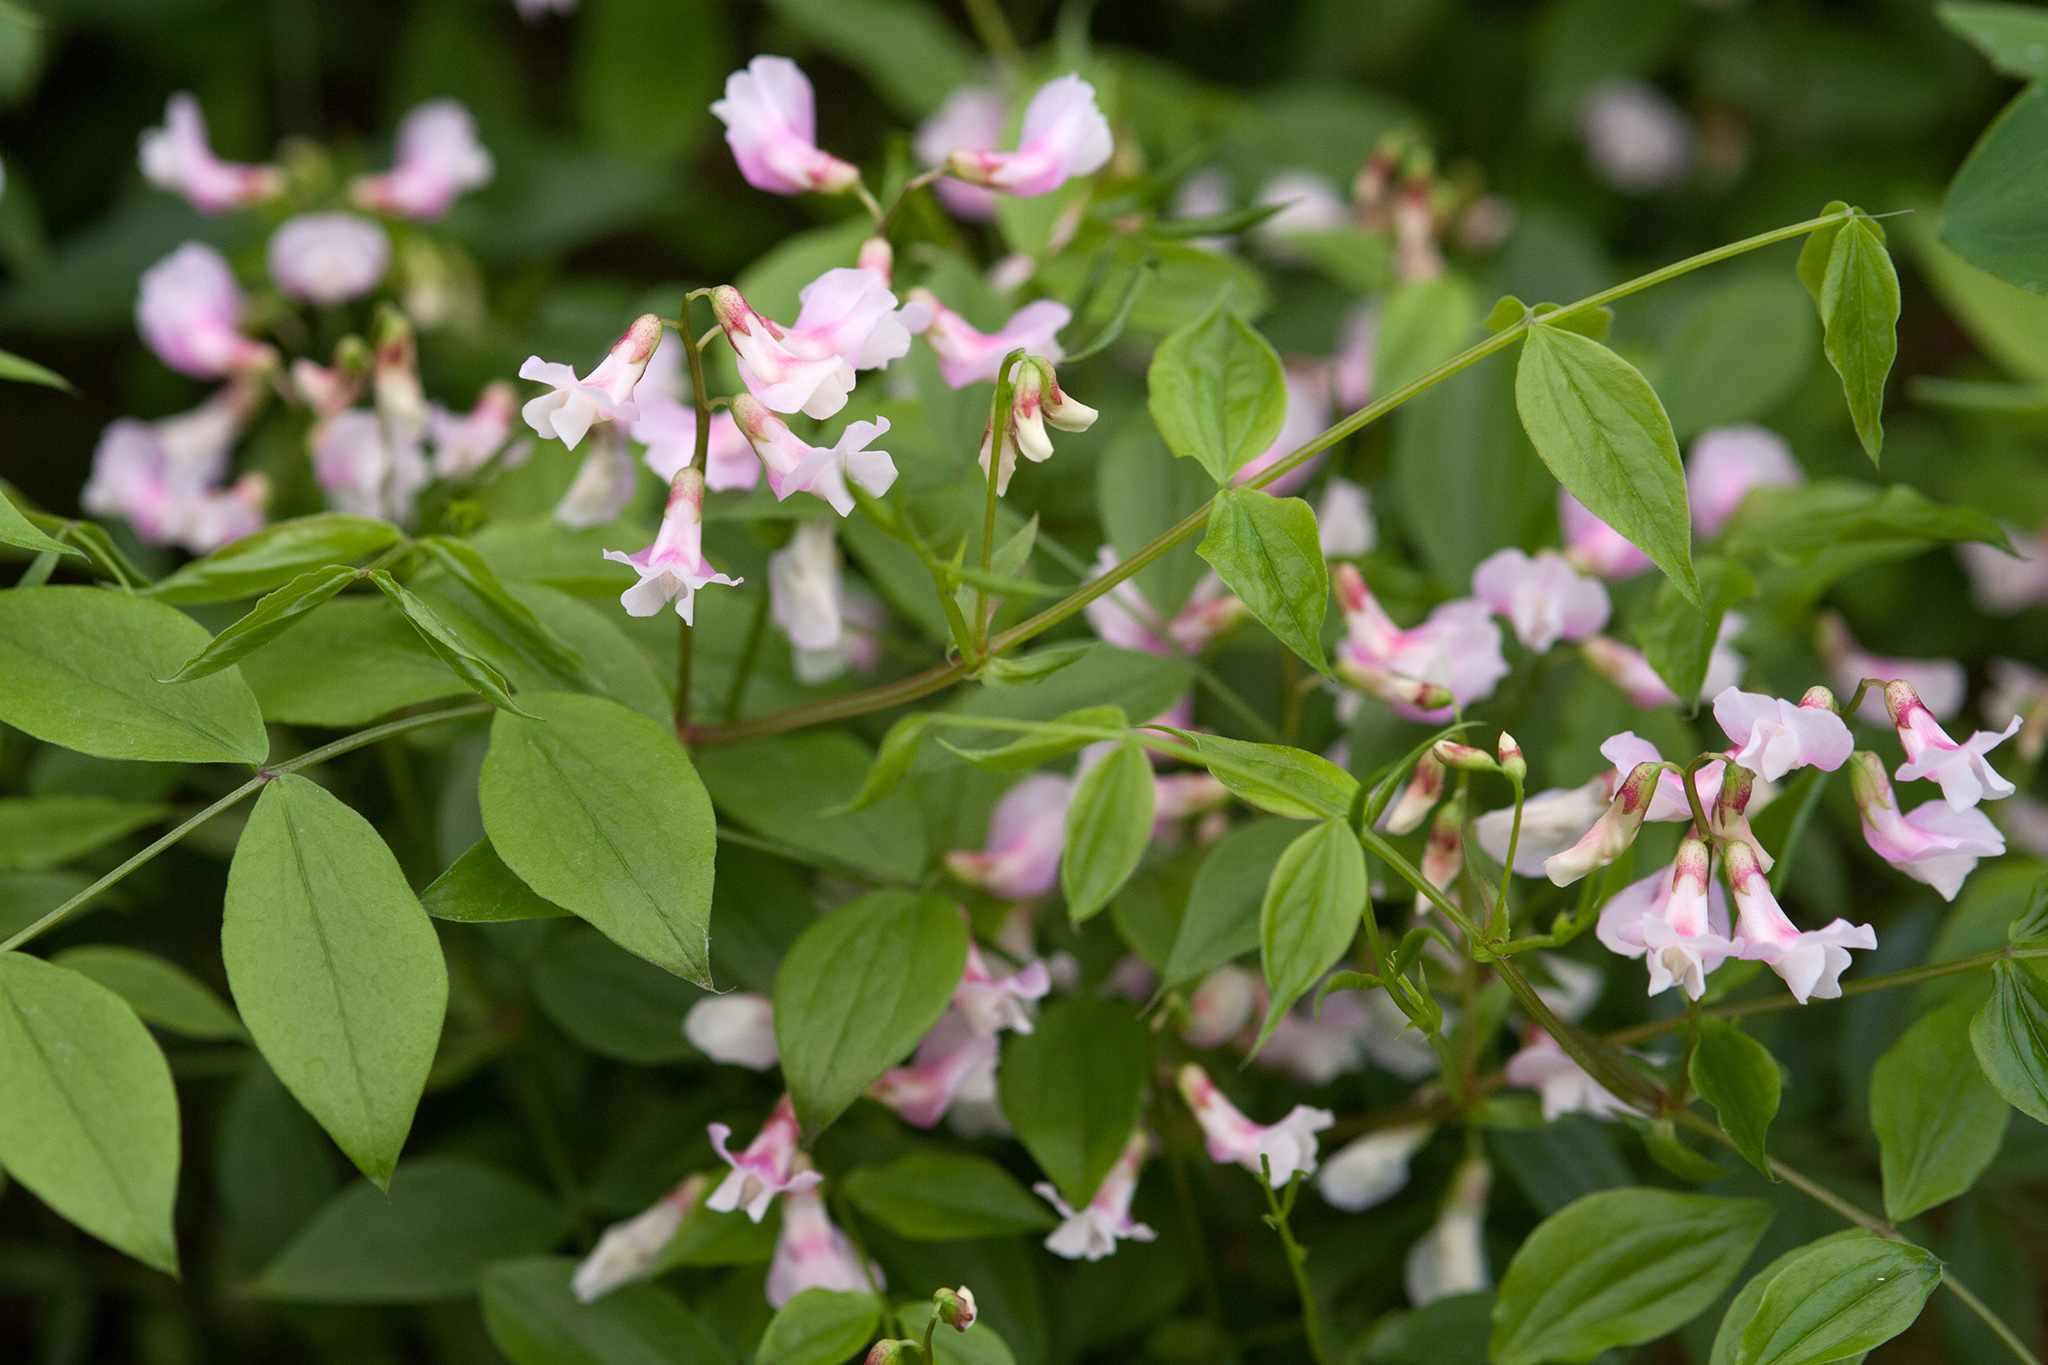 Lathyrus vernus 'Spring Melody'